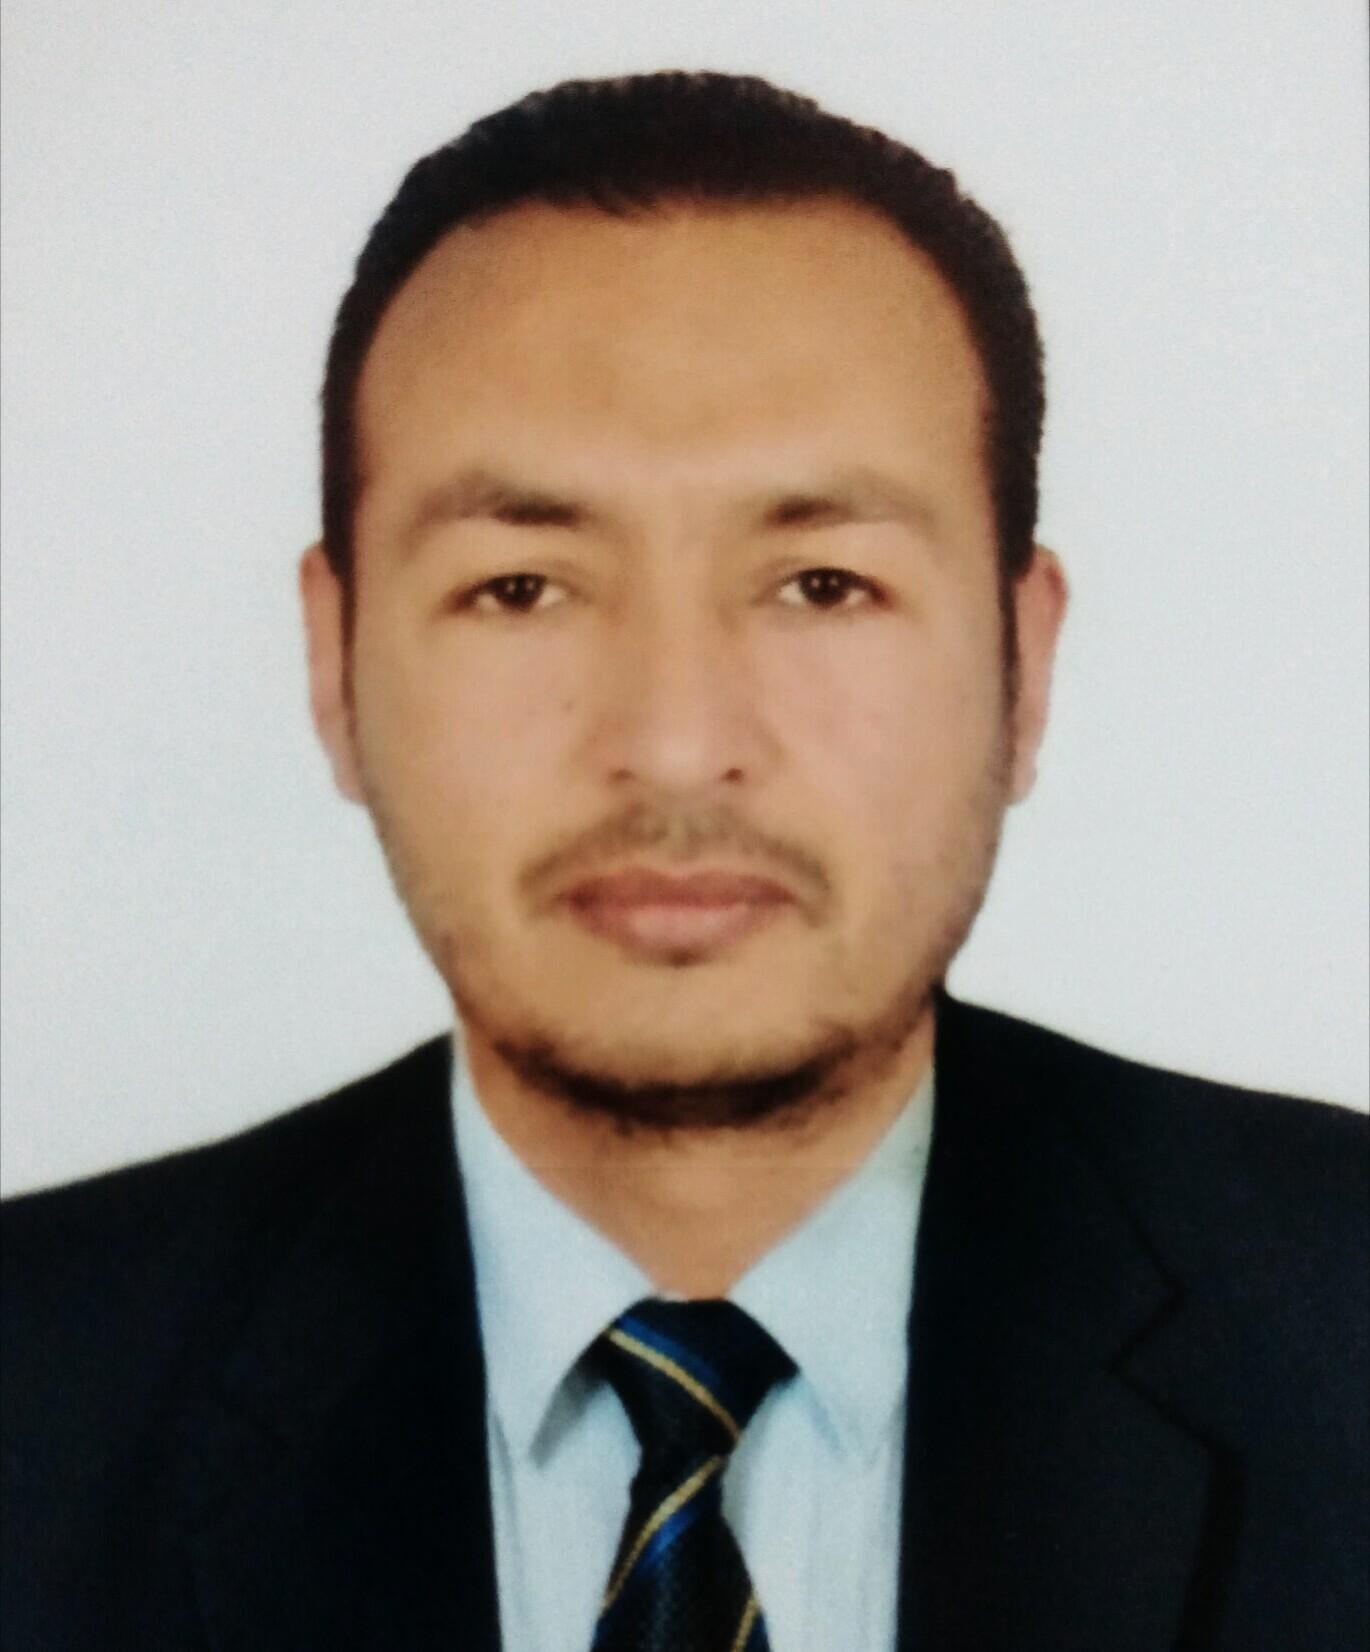 Tamer A. Addissouky